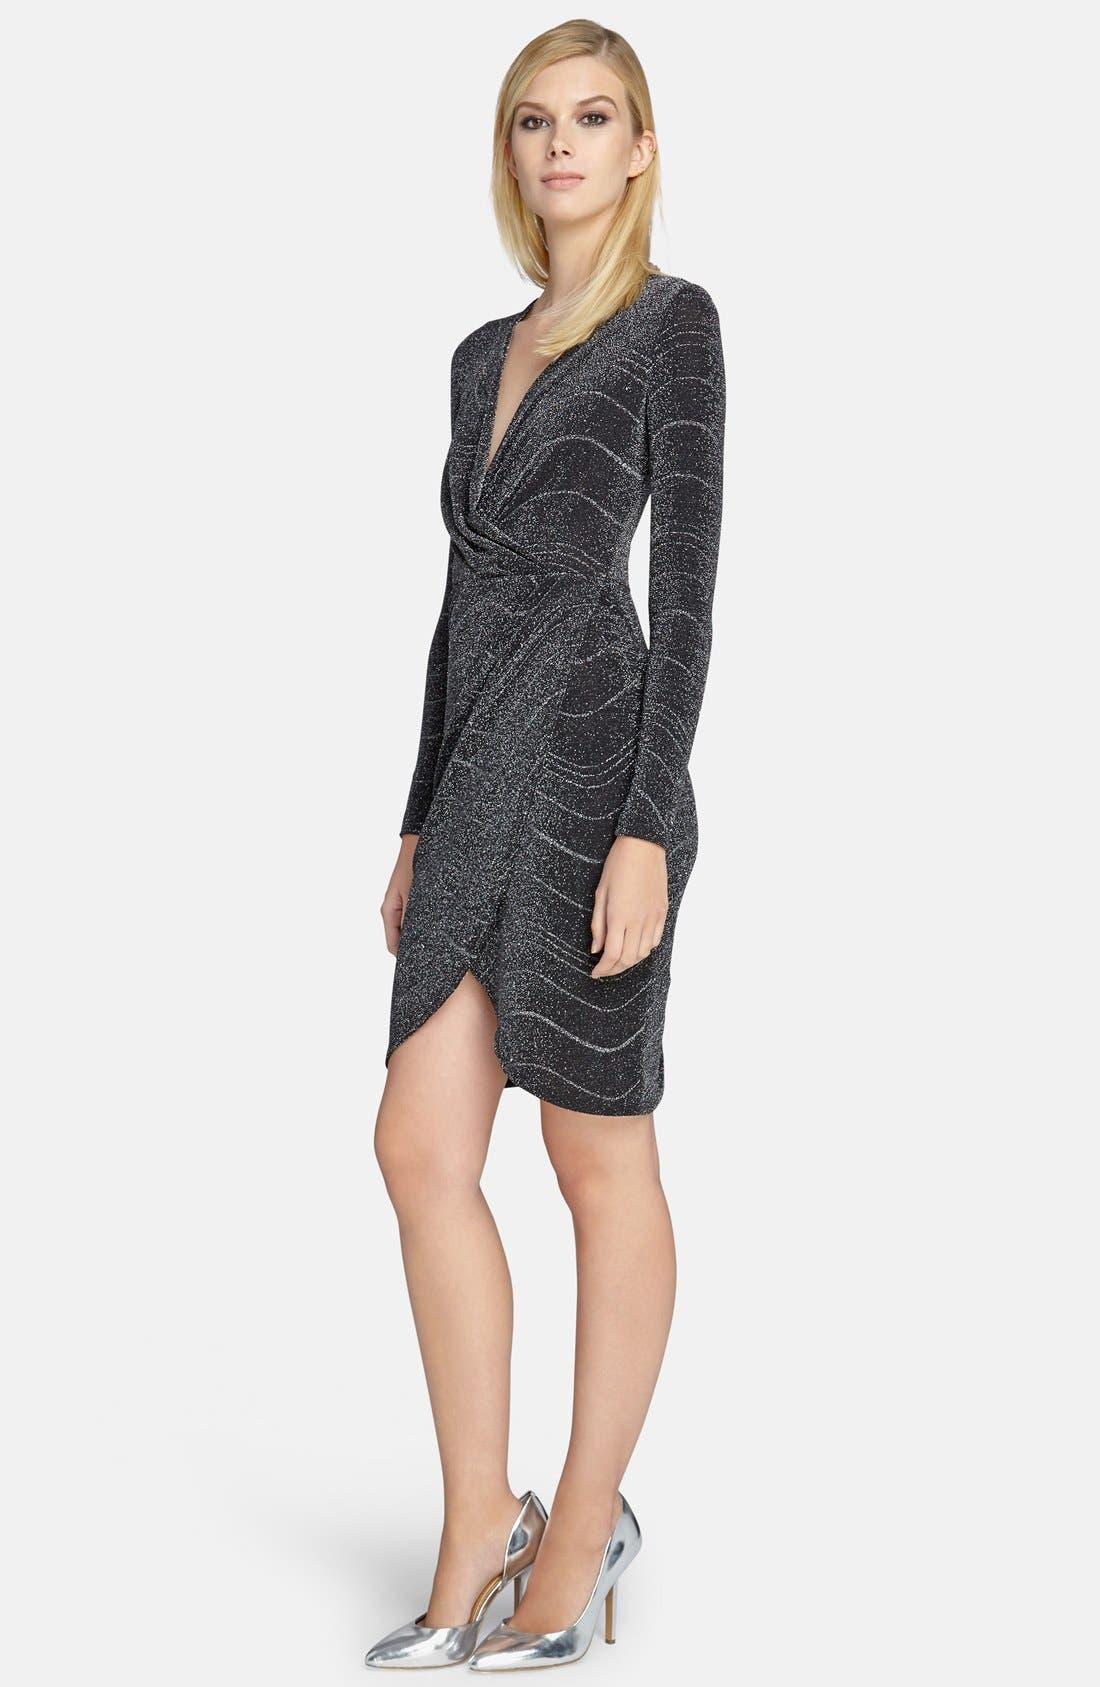 Alternate Image 1 Selected - Catherine Catherine Malandrino 'Marilyn' Metallic Kit Dress